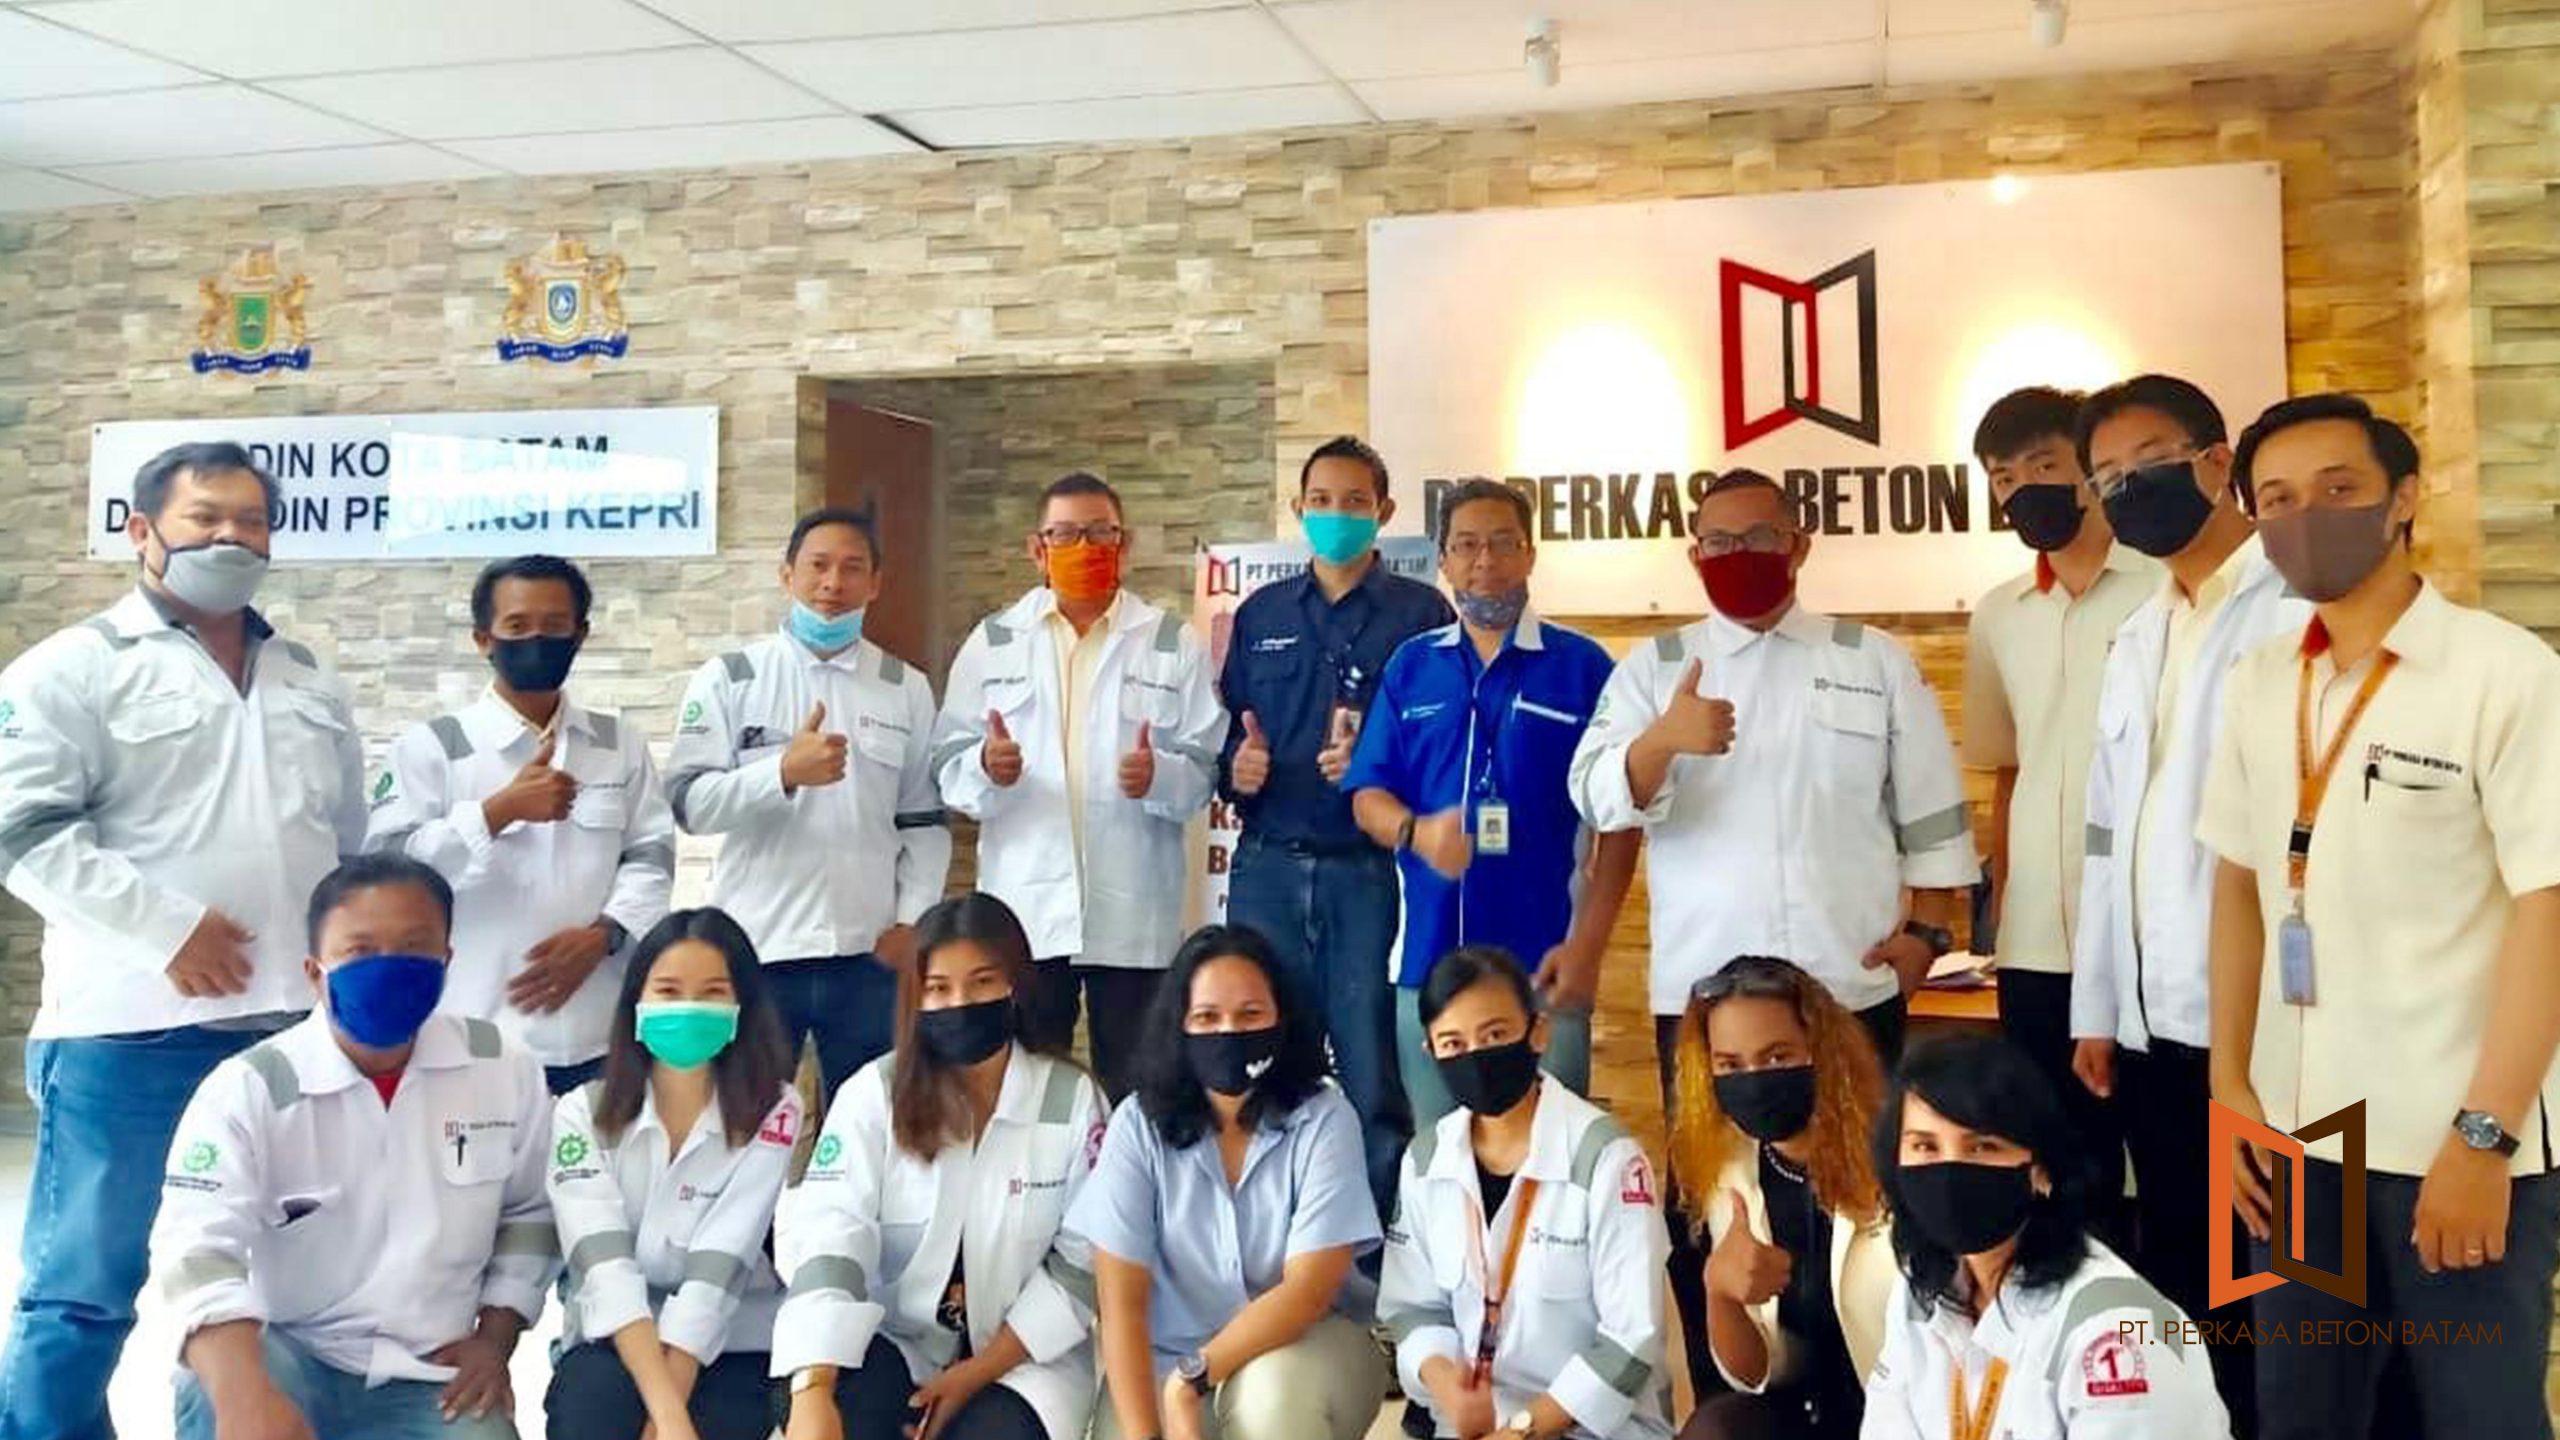 PERKASA BETON BATAM PANBIL Menerima Sertifikasi oleh TUV RHEINLAND INDONESIA